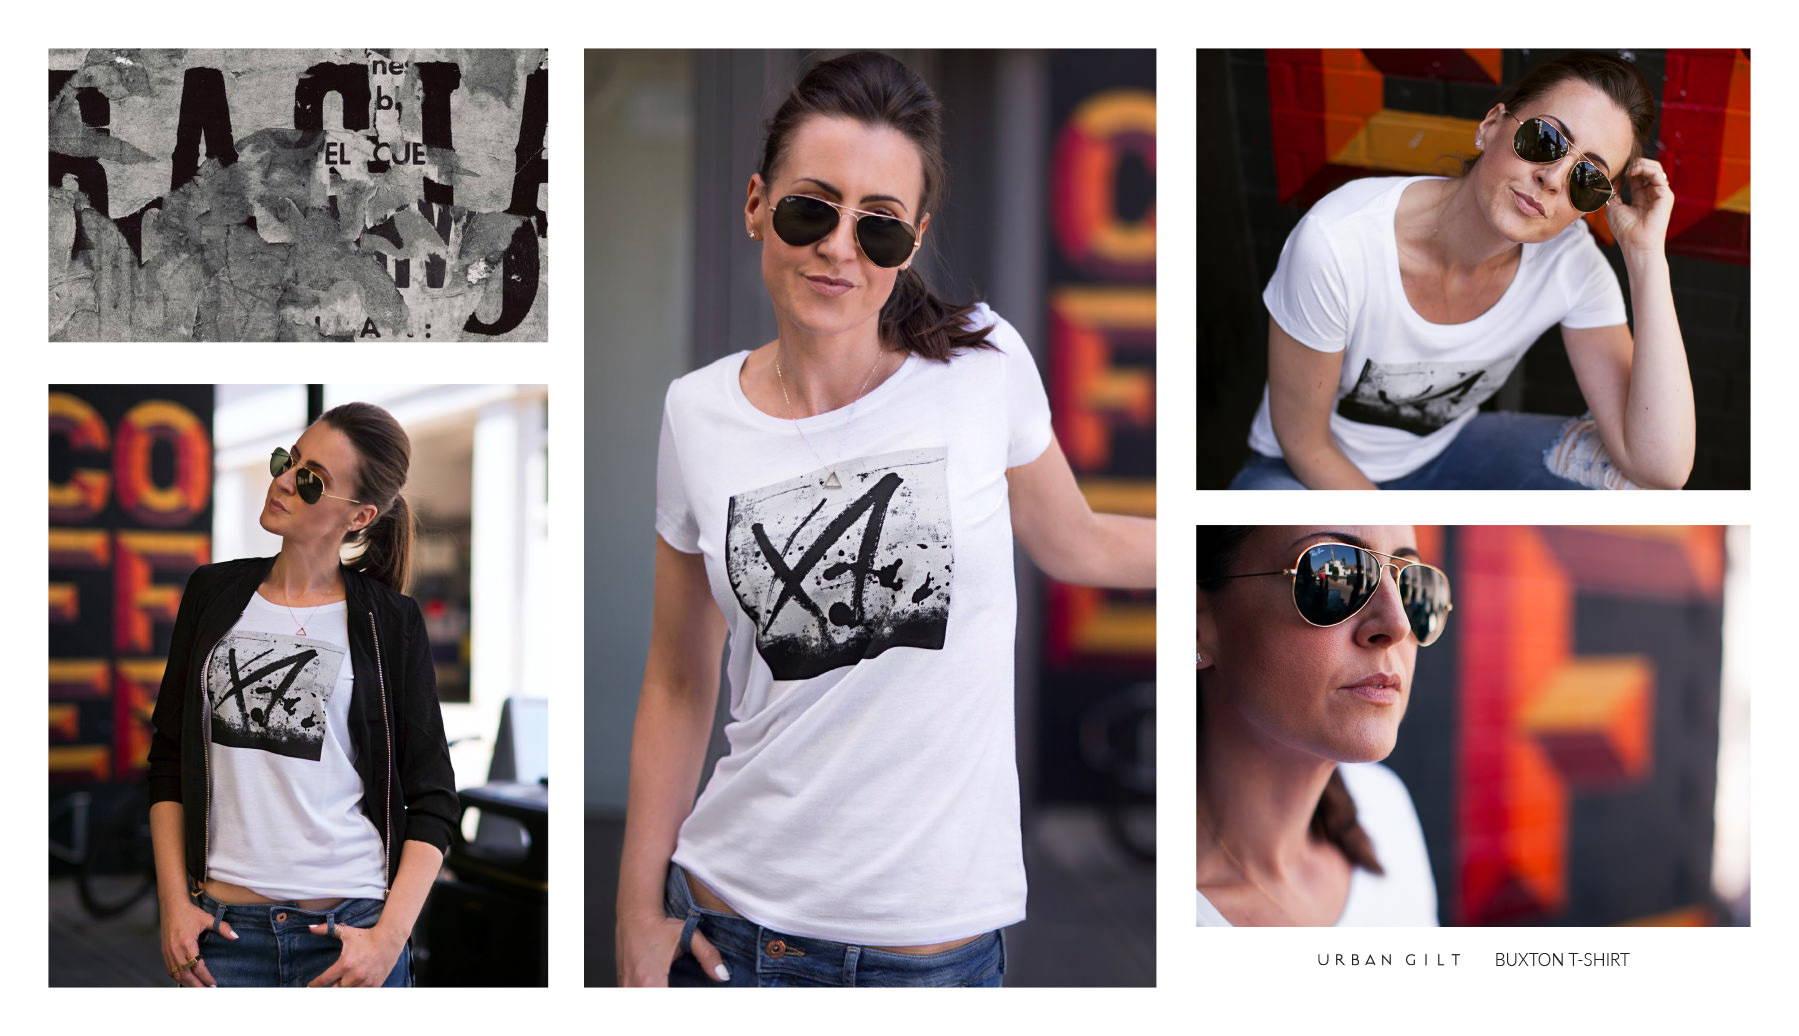 Urban Gilt Lookbook | Urban Textures | Buxton T-shirt